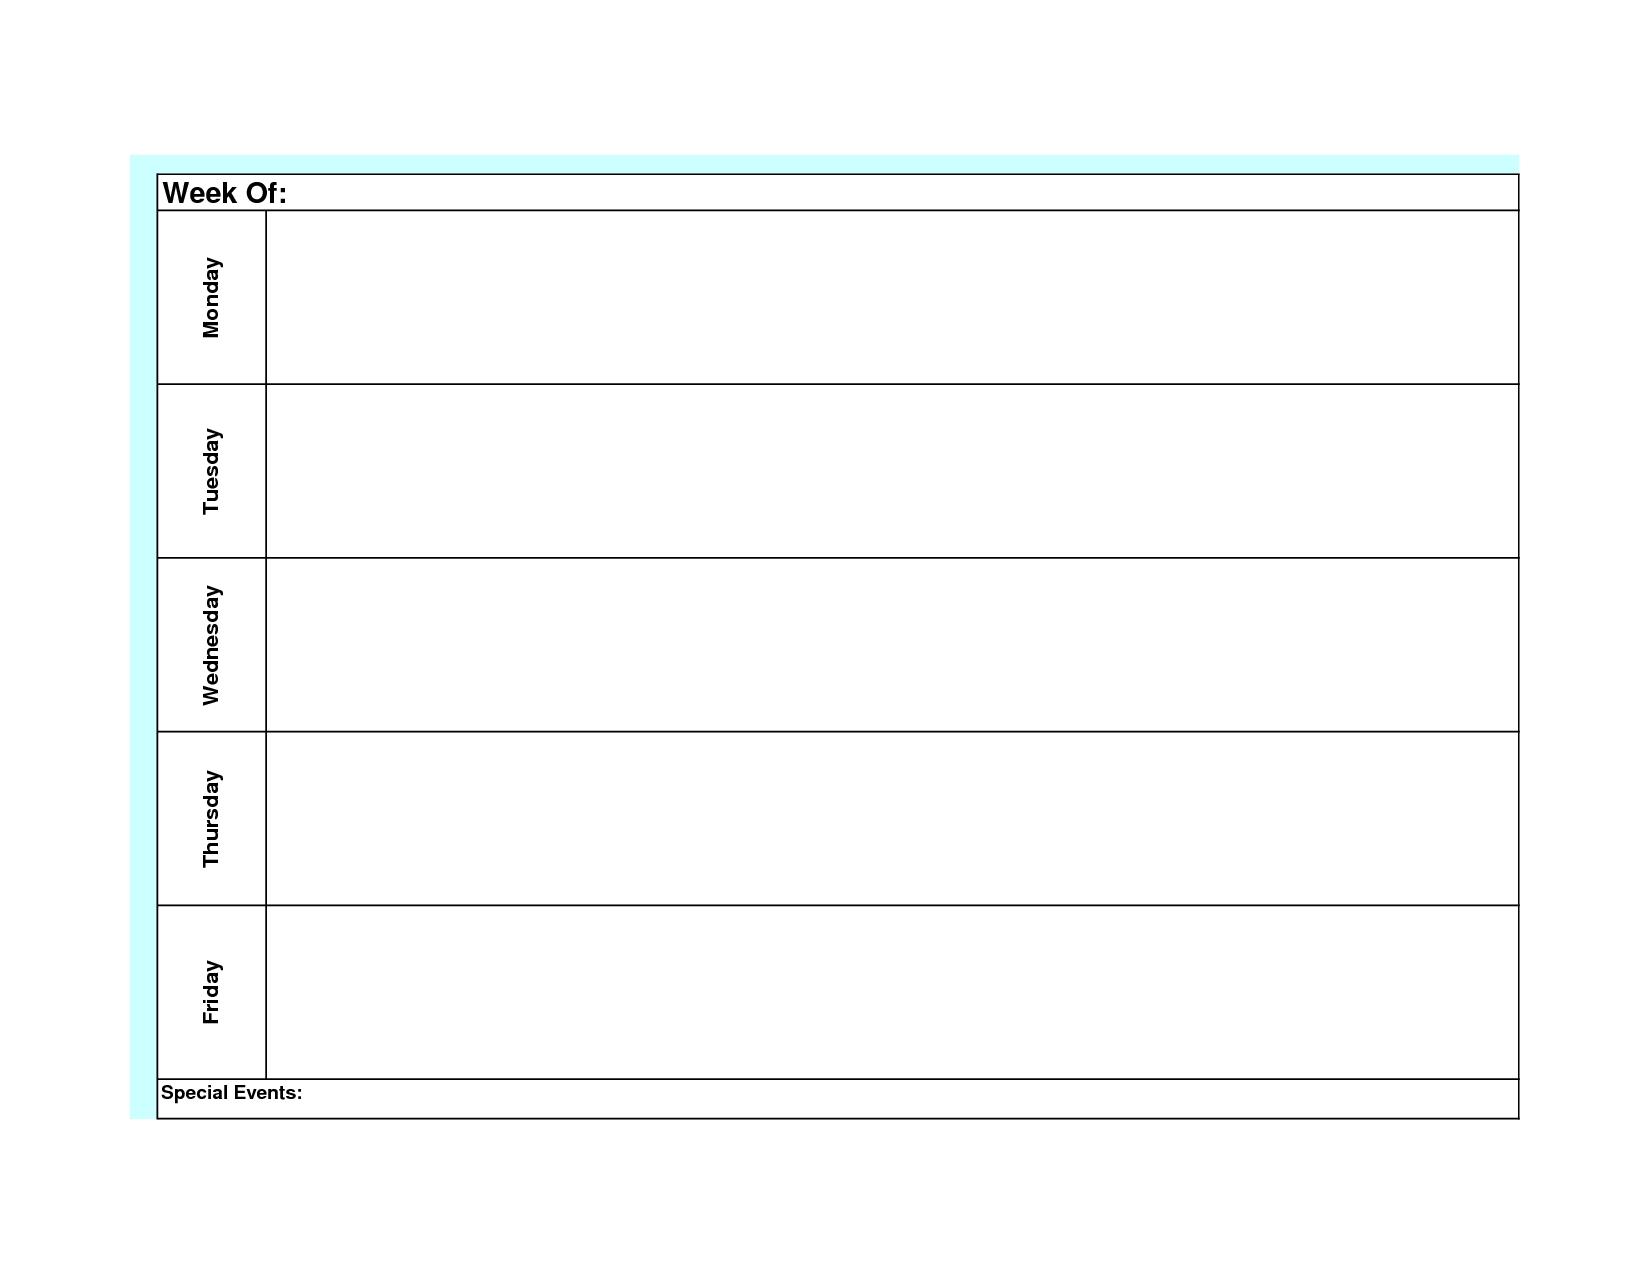 Blank Weekly Calendar Monday Through Friday Template Planner To | Smorad in Printable Monday Through Friday Calendar